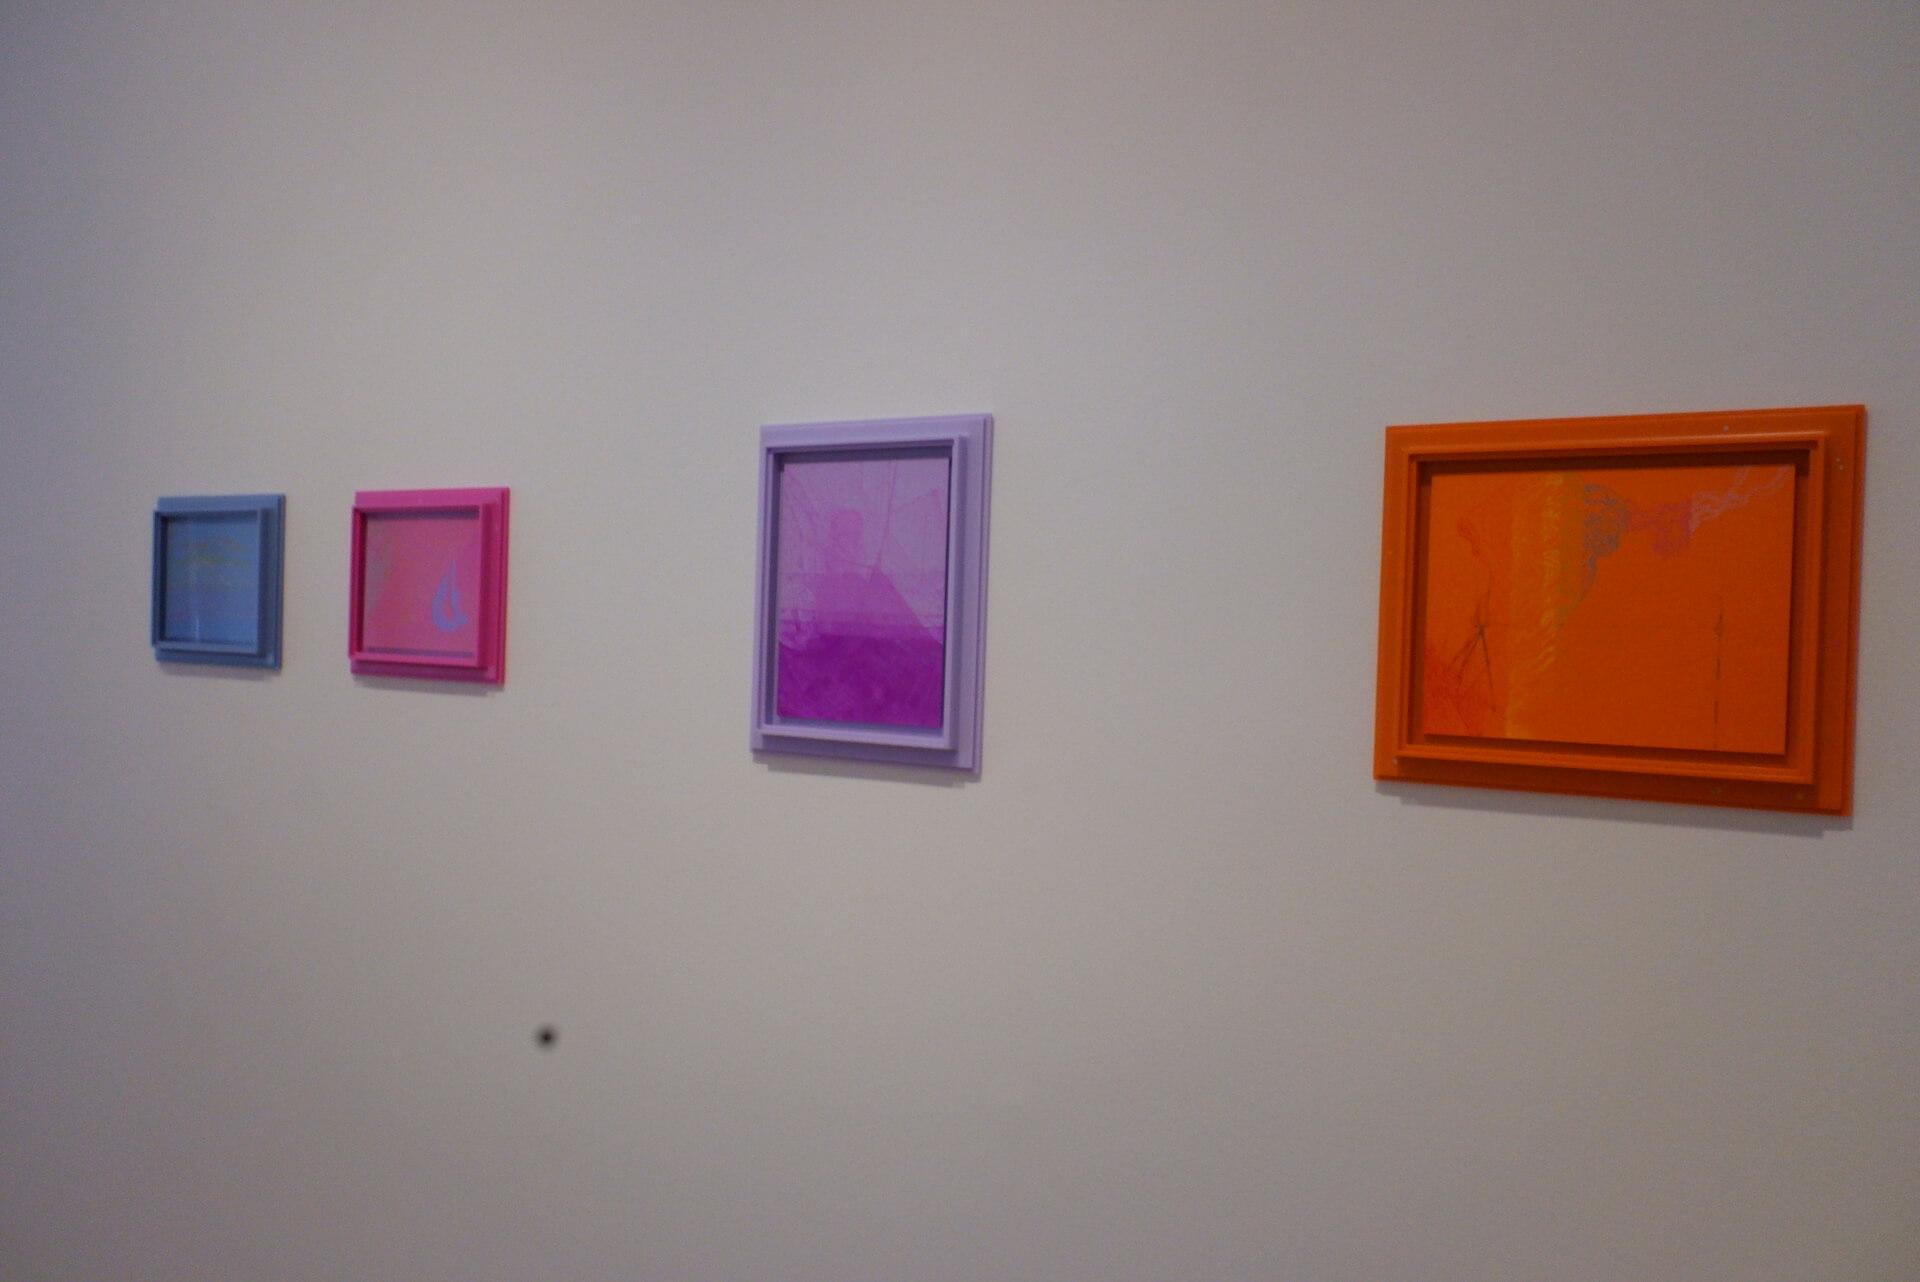 『Berlin Art Week』現地レポート 進化し変化し続けるベルリンのアートカルチャー column210929kana-miyazawa-09